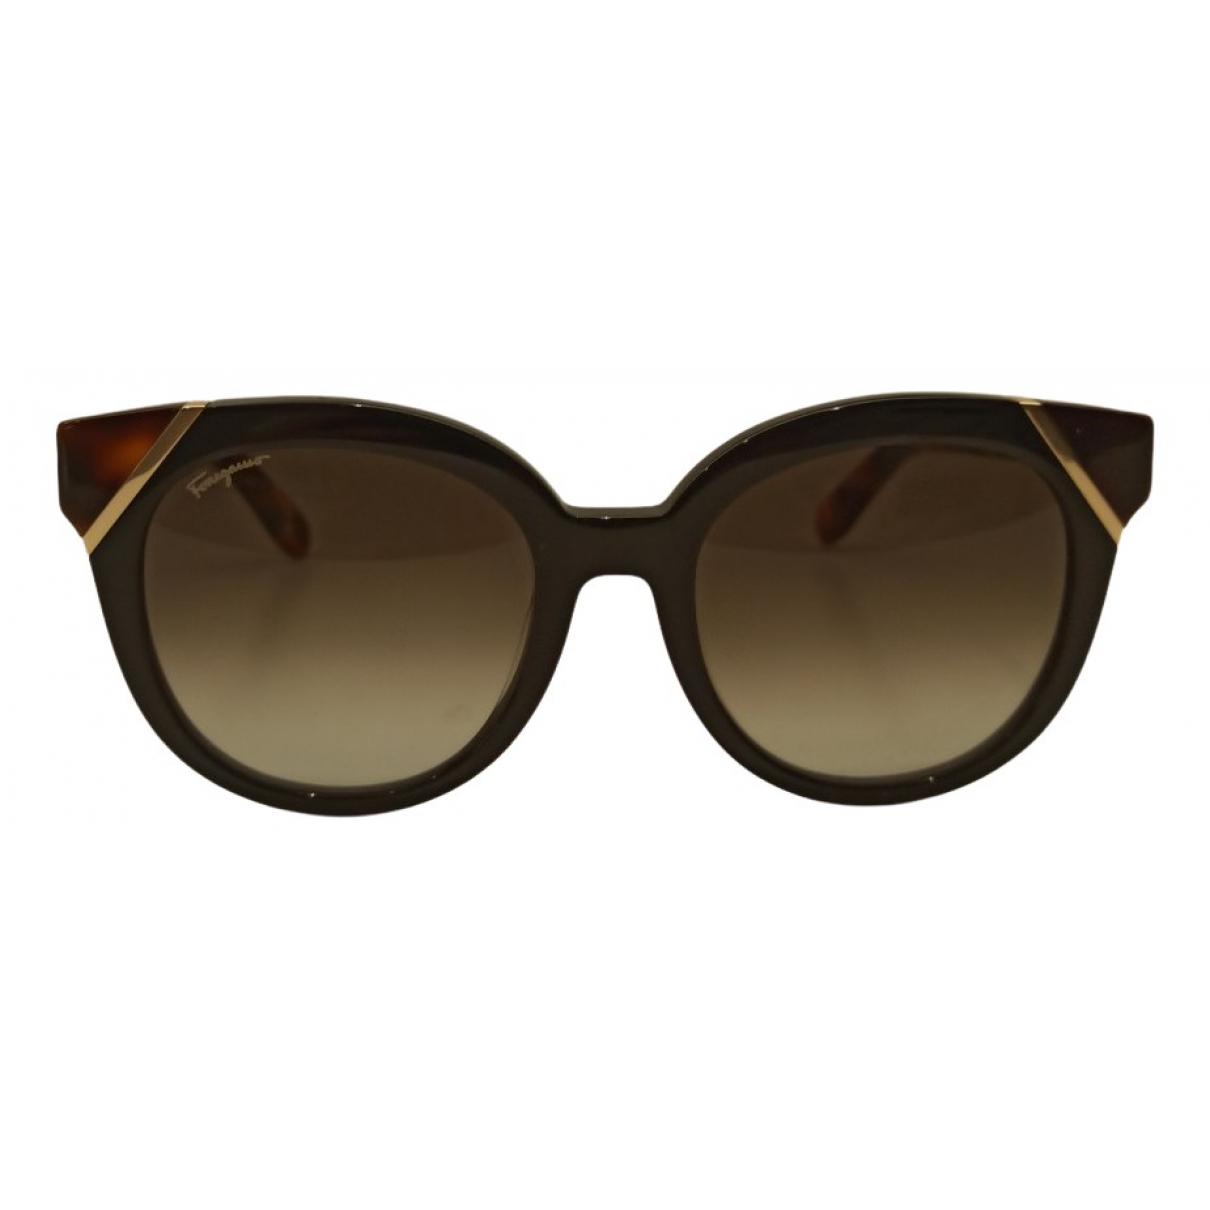 Gafas oversize Salvatore Ferragamo